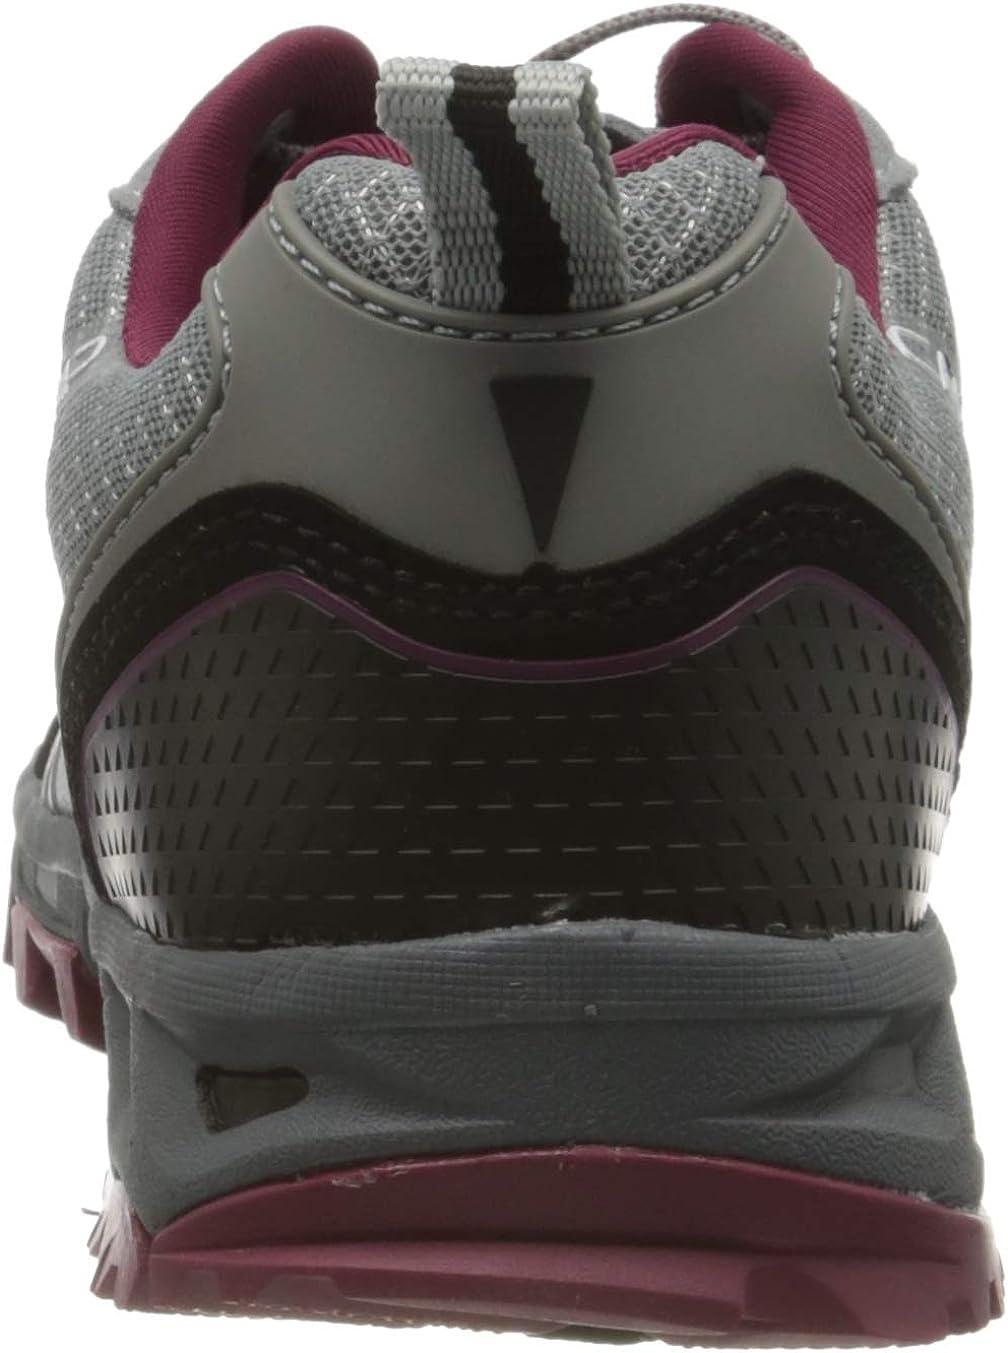 CMP – F.lli Campagnolo Altak Wmn Shoe, Zapatillas de Trail Running para Mujer Gris Cemento Goji 59ue